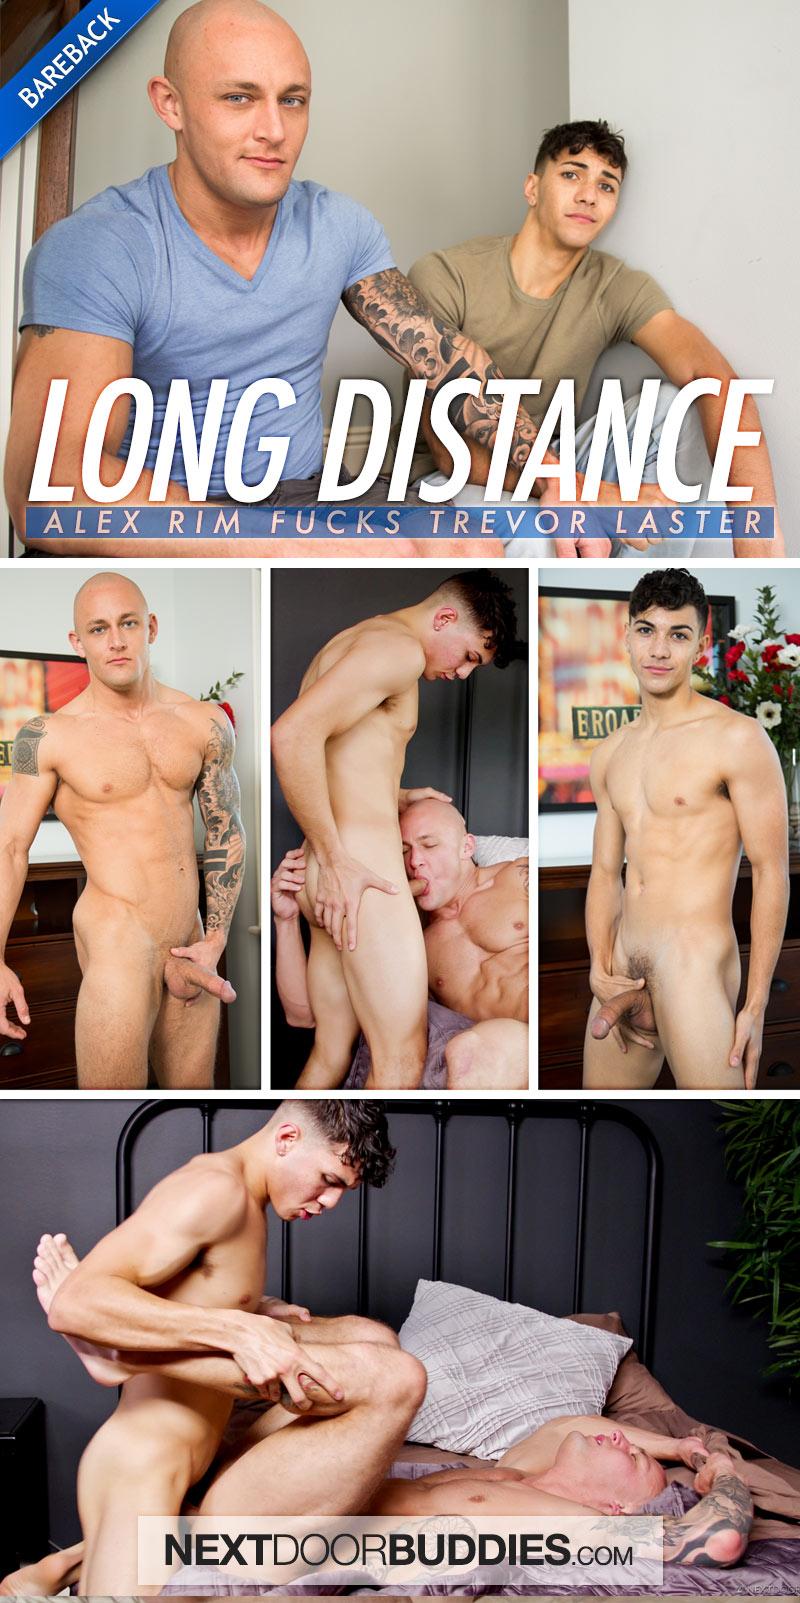 Long Distance (Alex Rim Fucks Trevor Laster) at Next Door Buddies